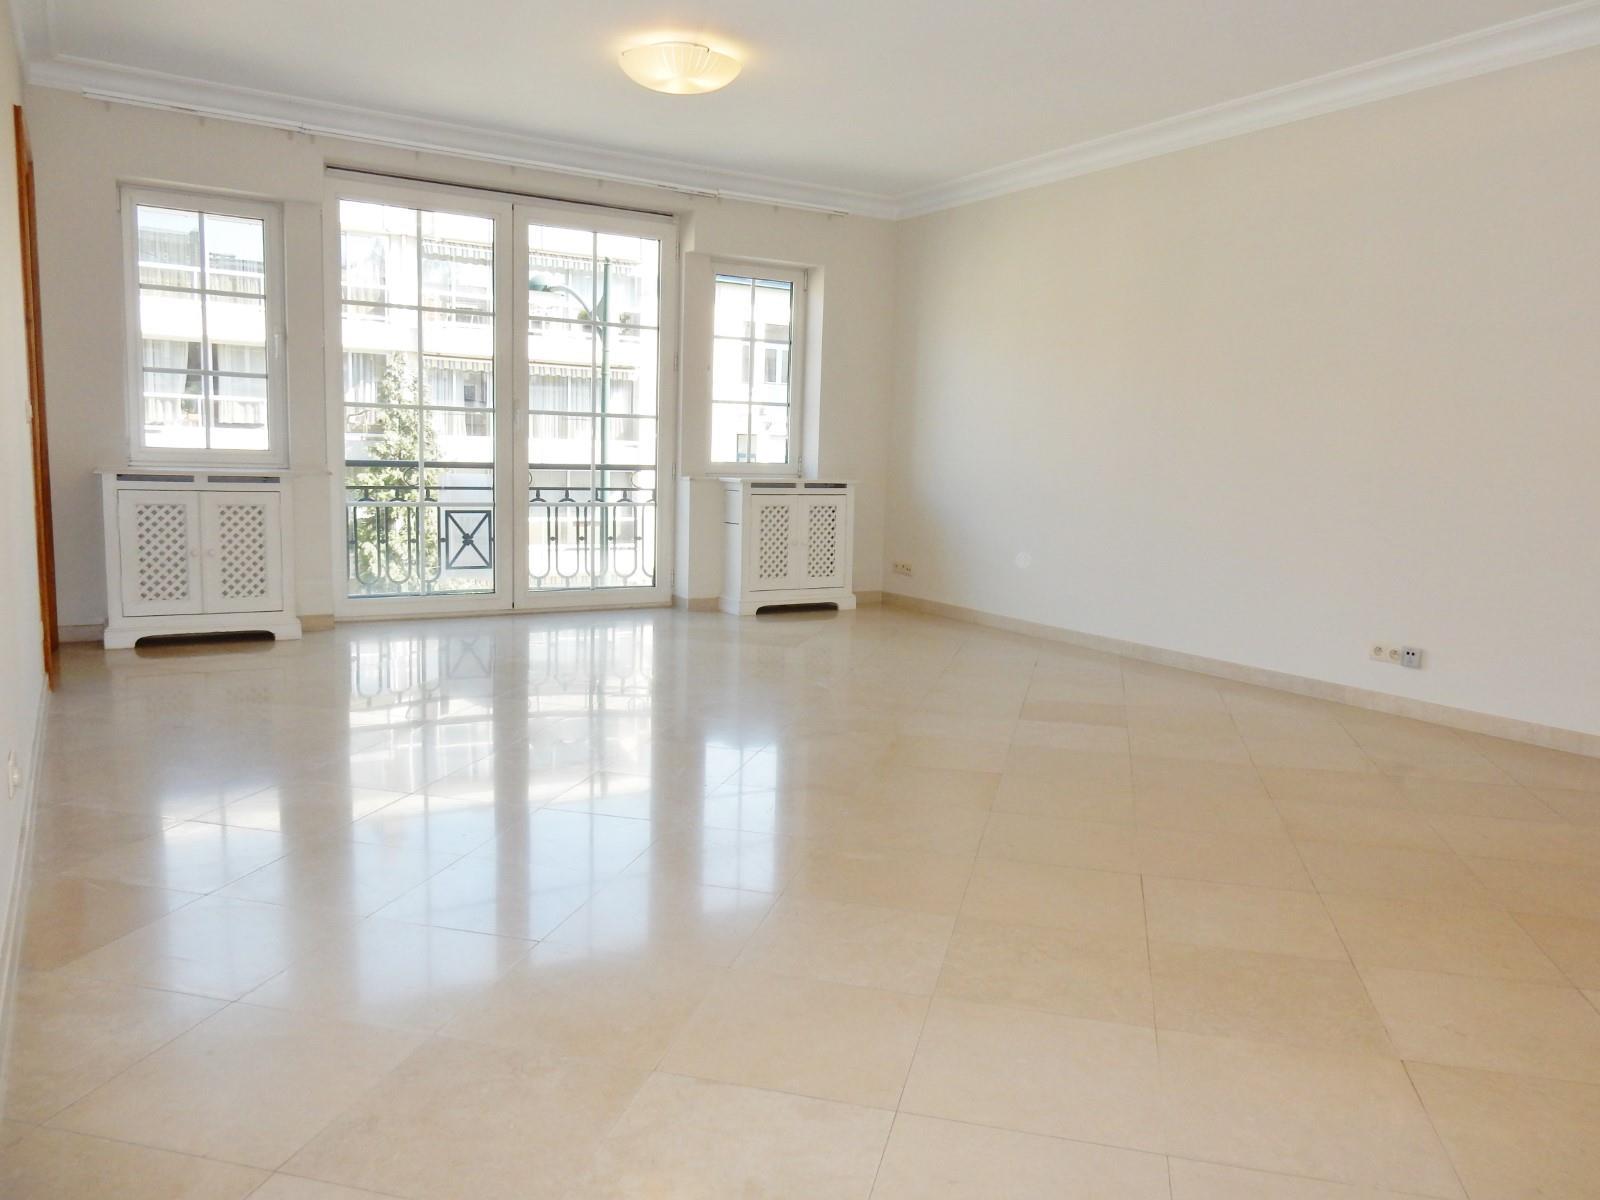 Exceptional apartment  - Woluwe-Saint-Pierre - #3116510-24